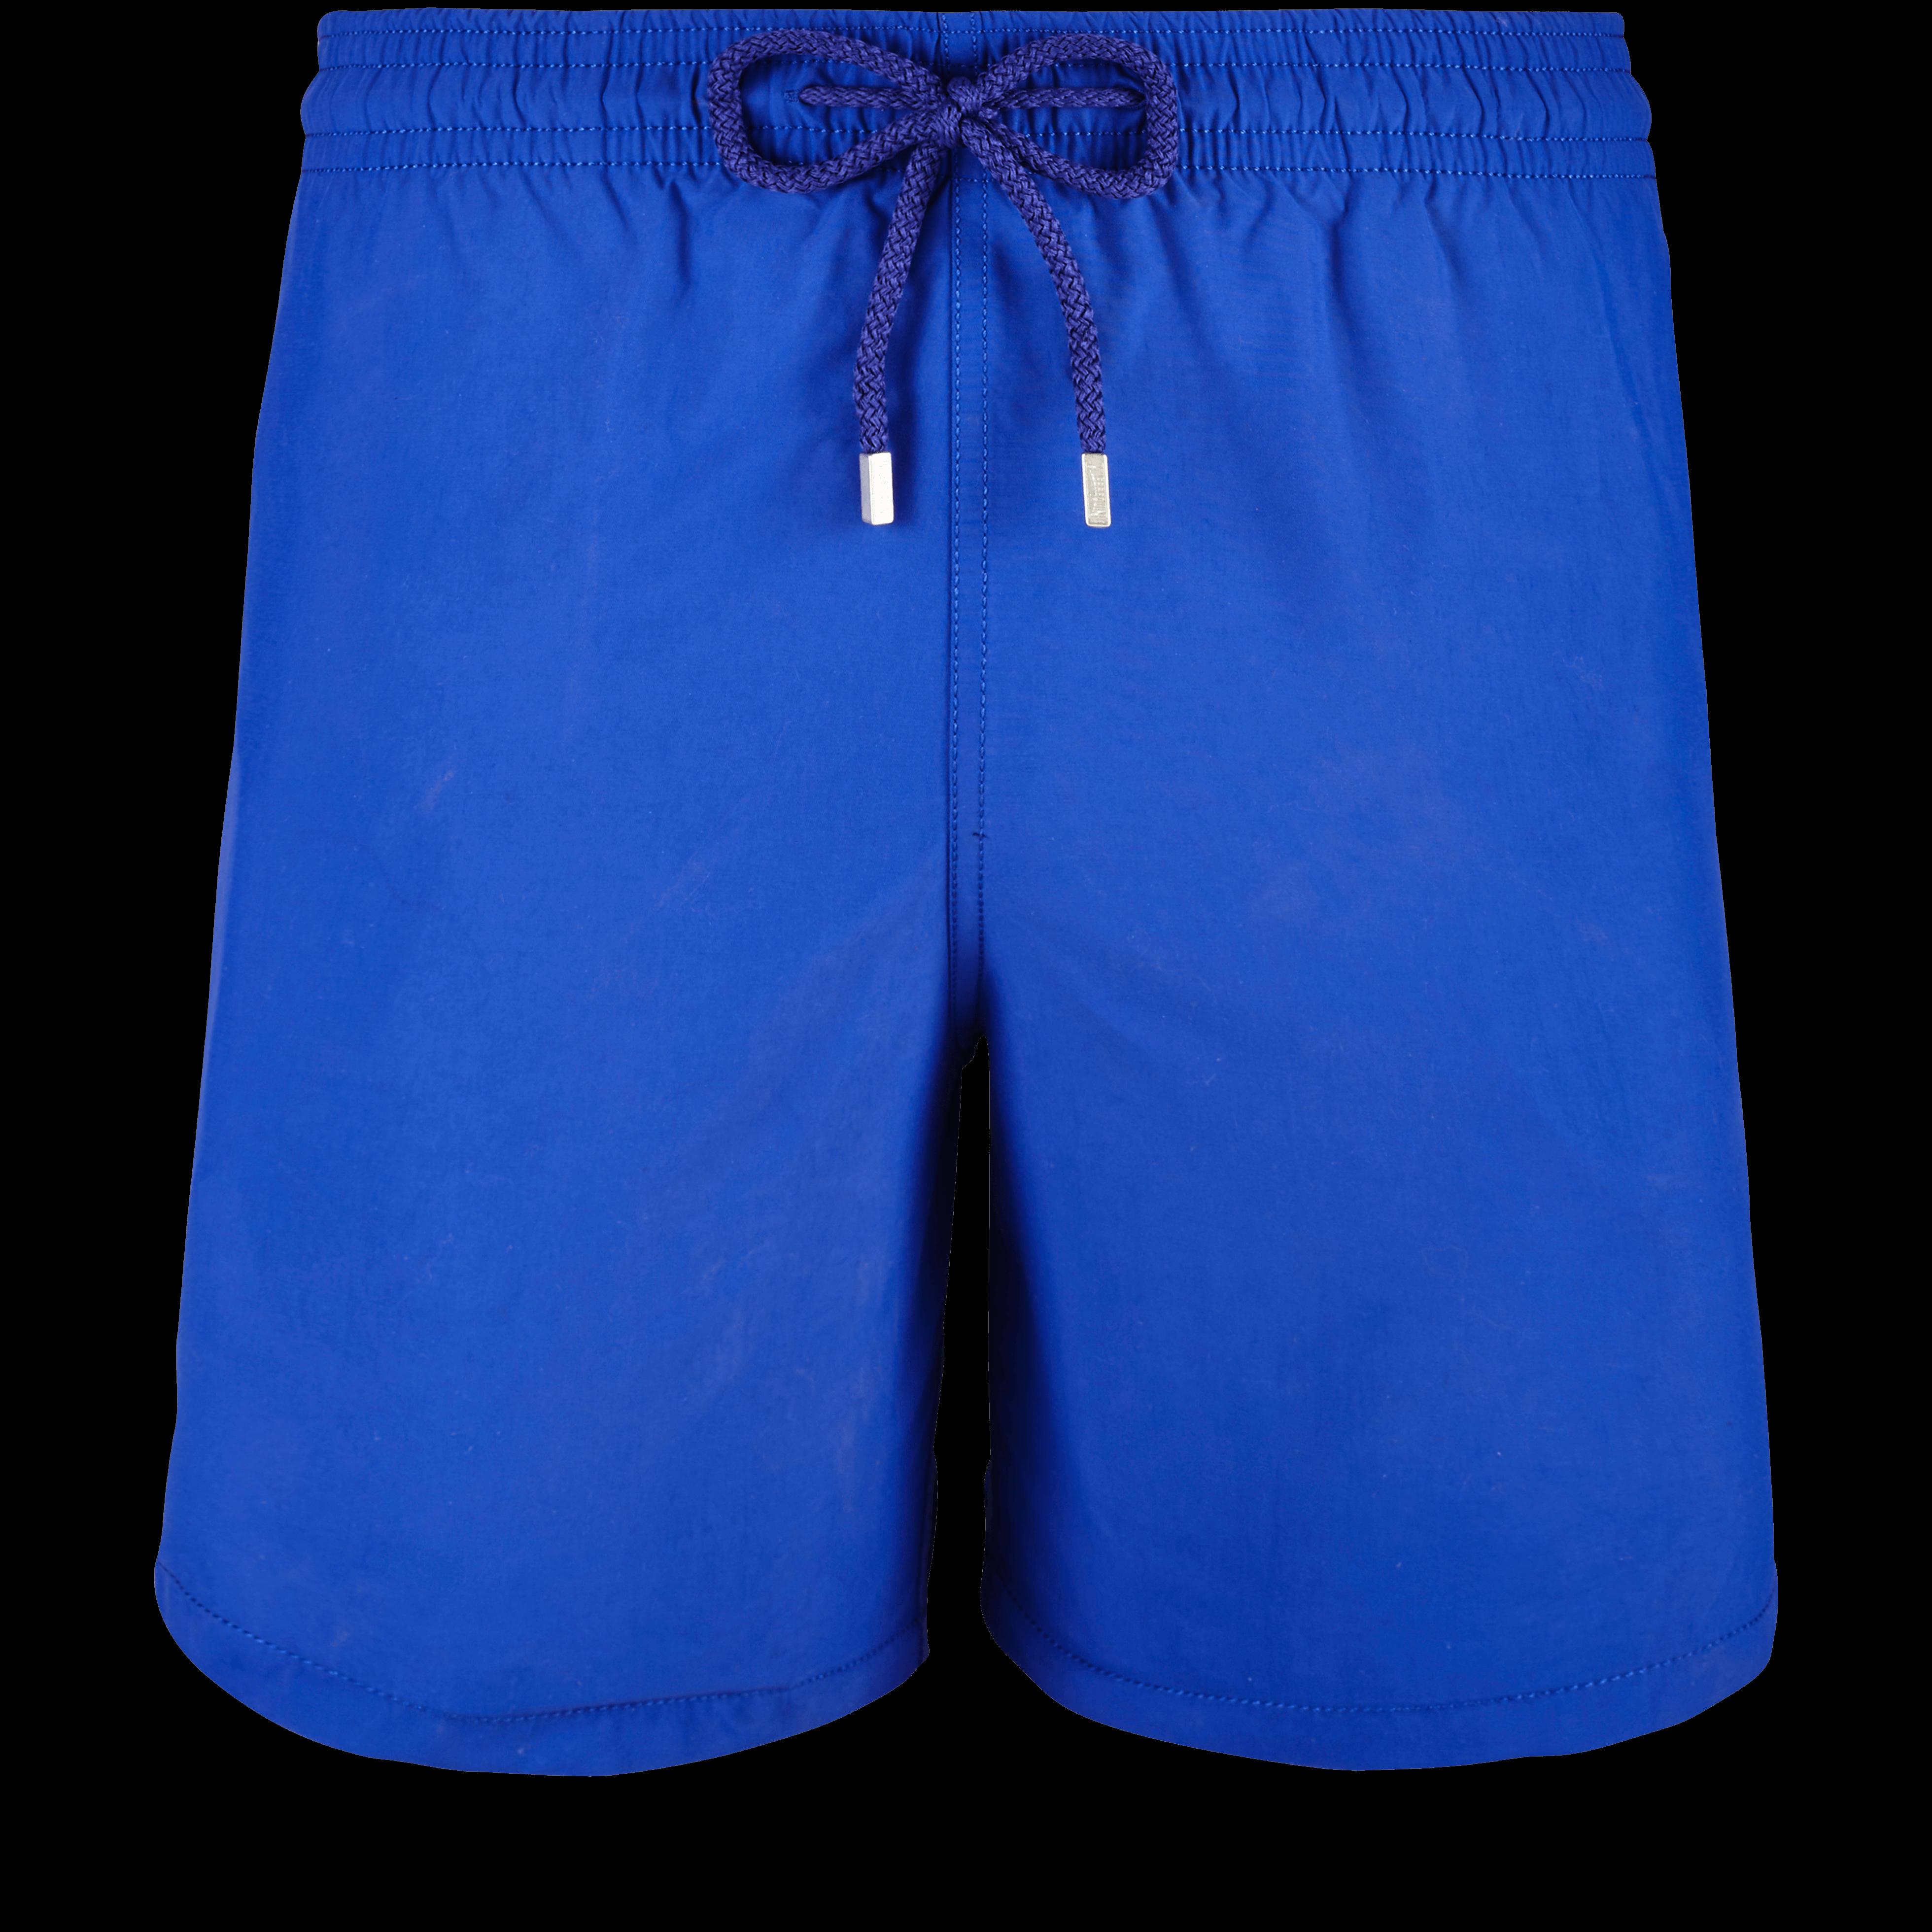 Men Swimwear - Men Water-Reactive Swimwear Starfish Art - Swimming Trunk - Moorea in Blue